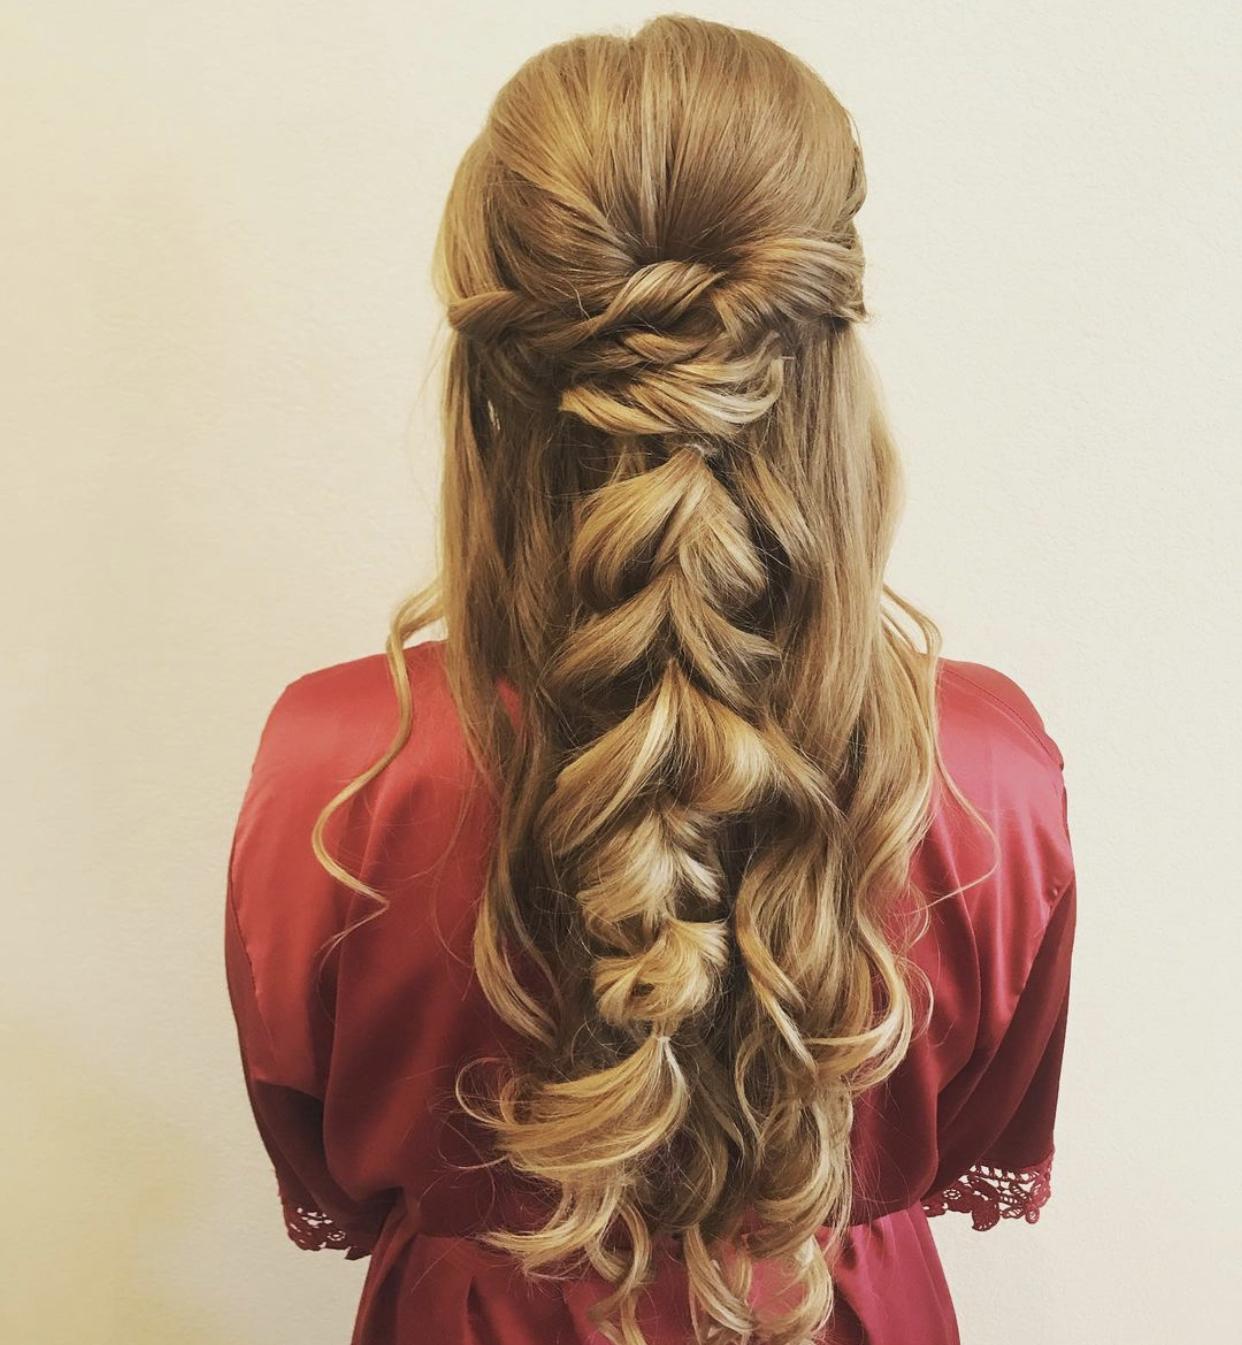 Formal style updo by hair stylist Mariesol Pool